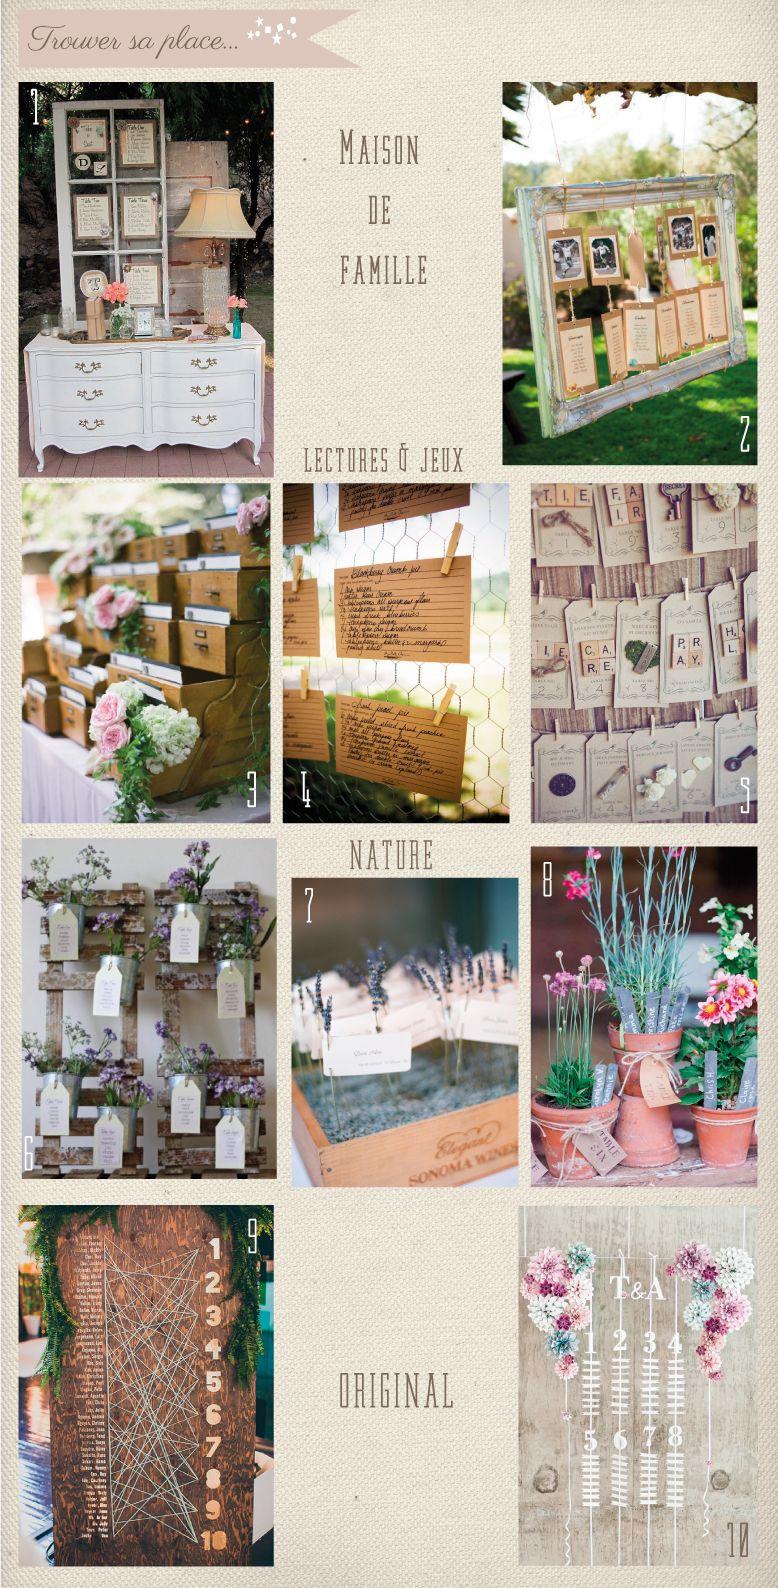 Sa wedding decor images  Dans ma bibliothèqueu  Inspirations fleuries par Nessa B  Wedding